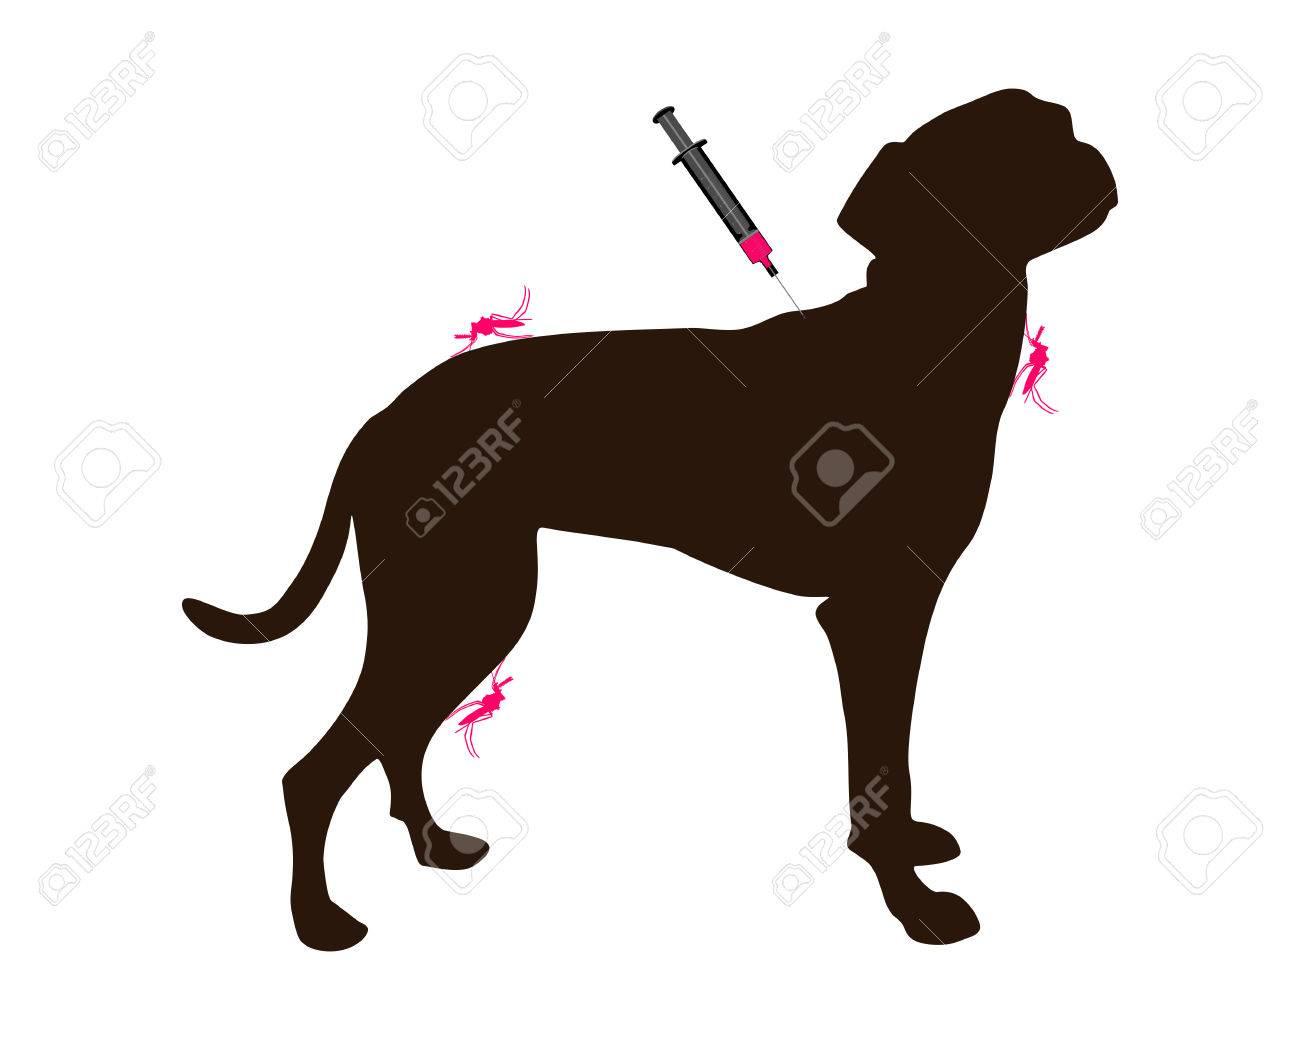 Mosquito Bites on Dogs Disease of Mosquito Bites